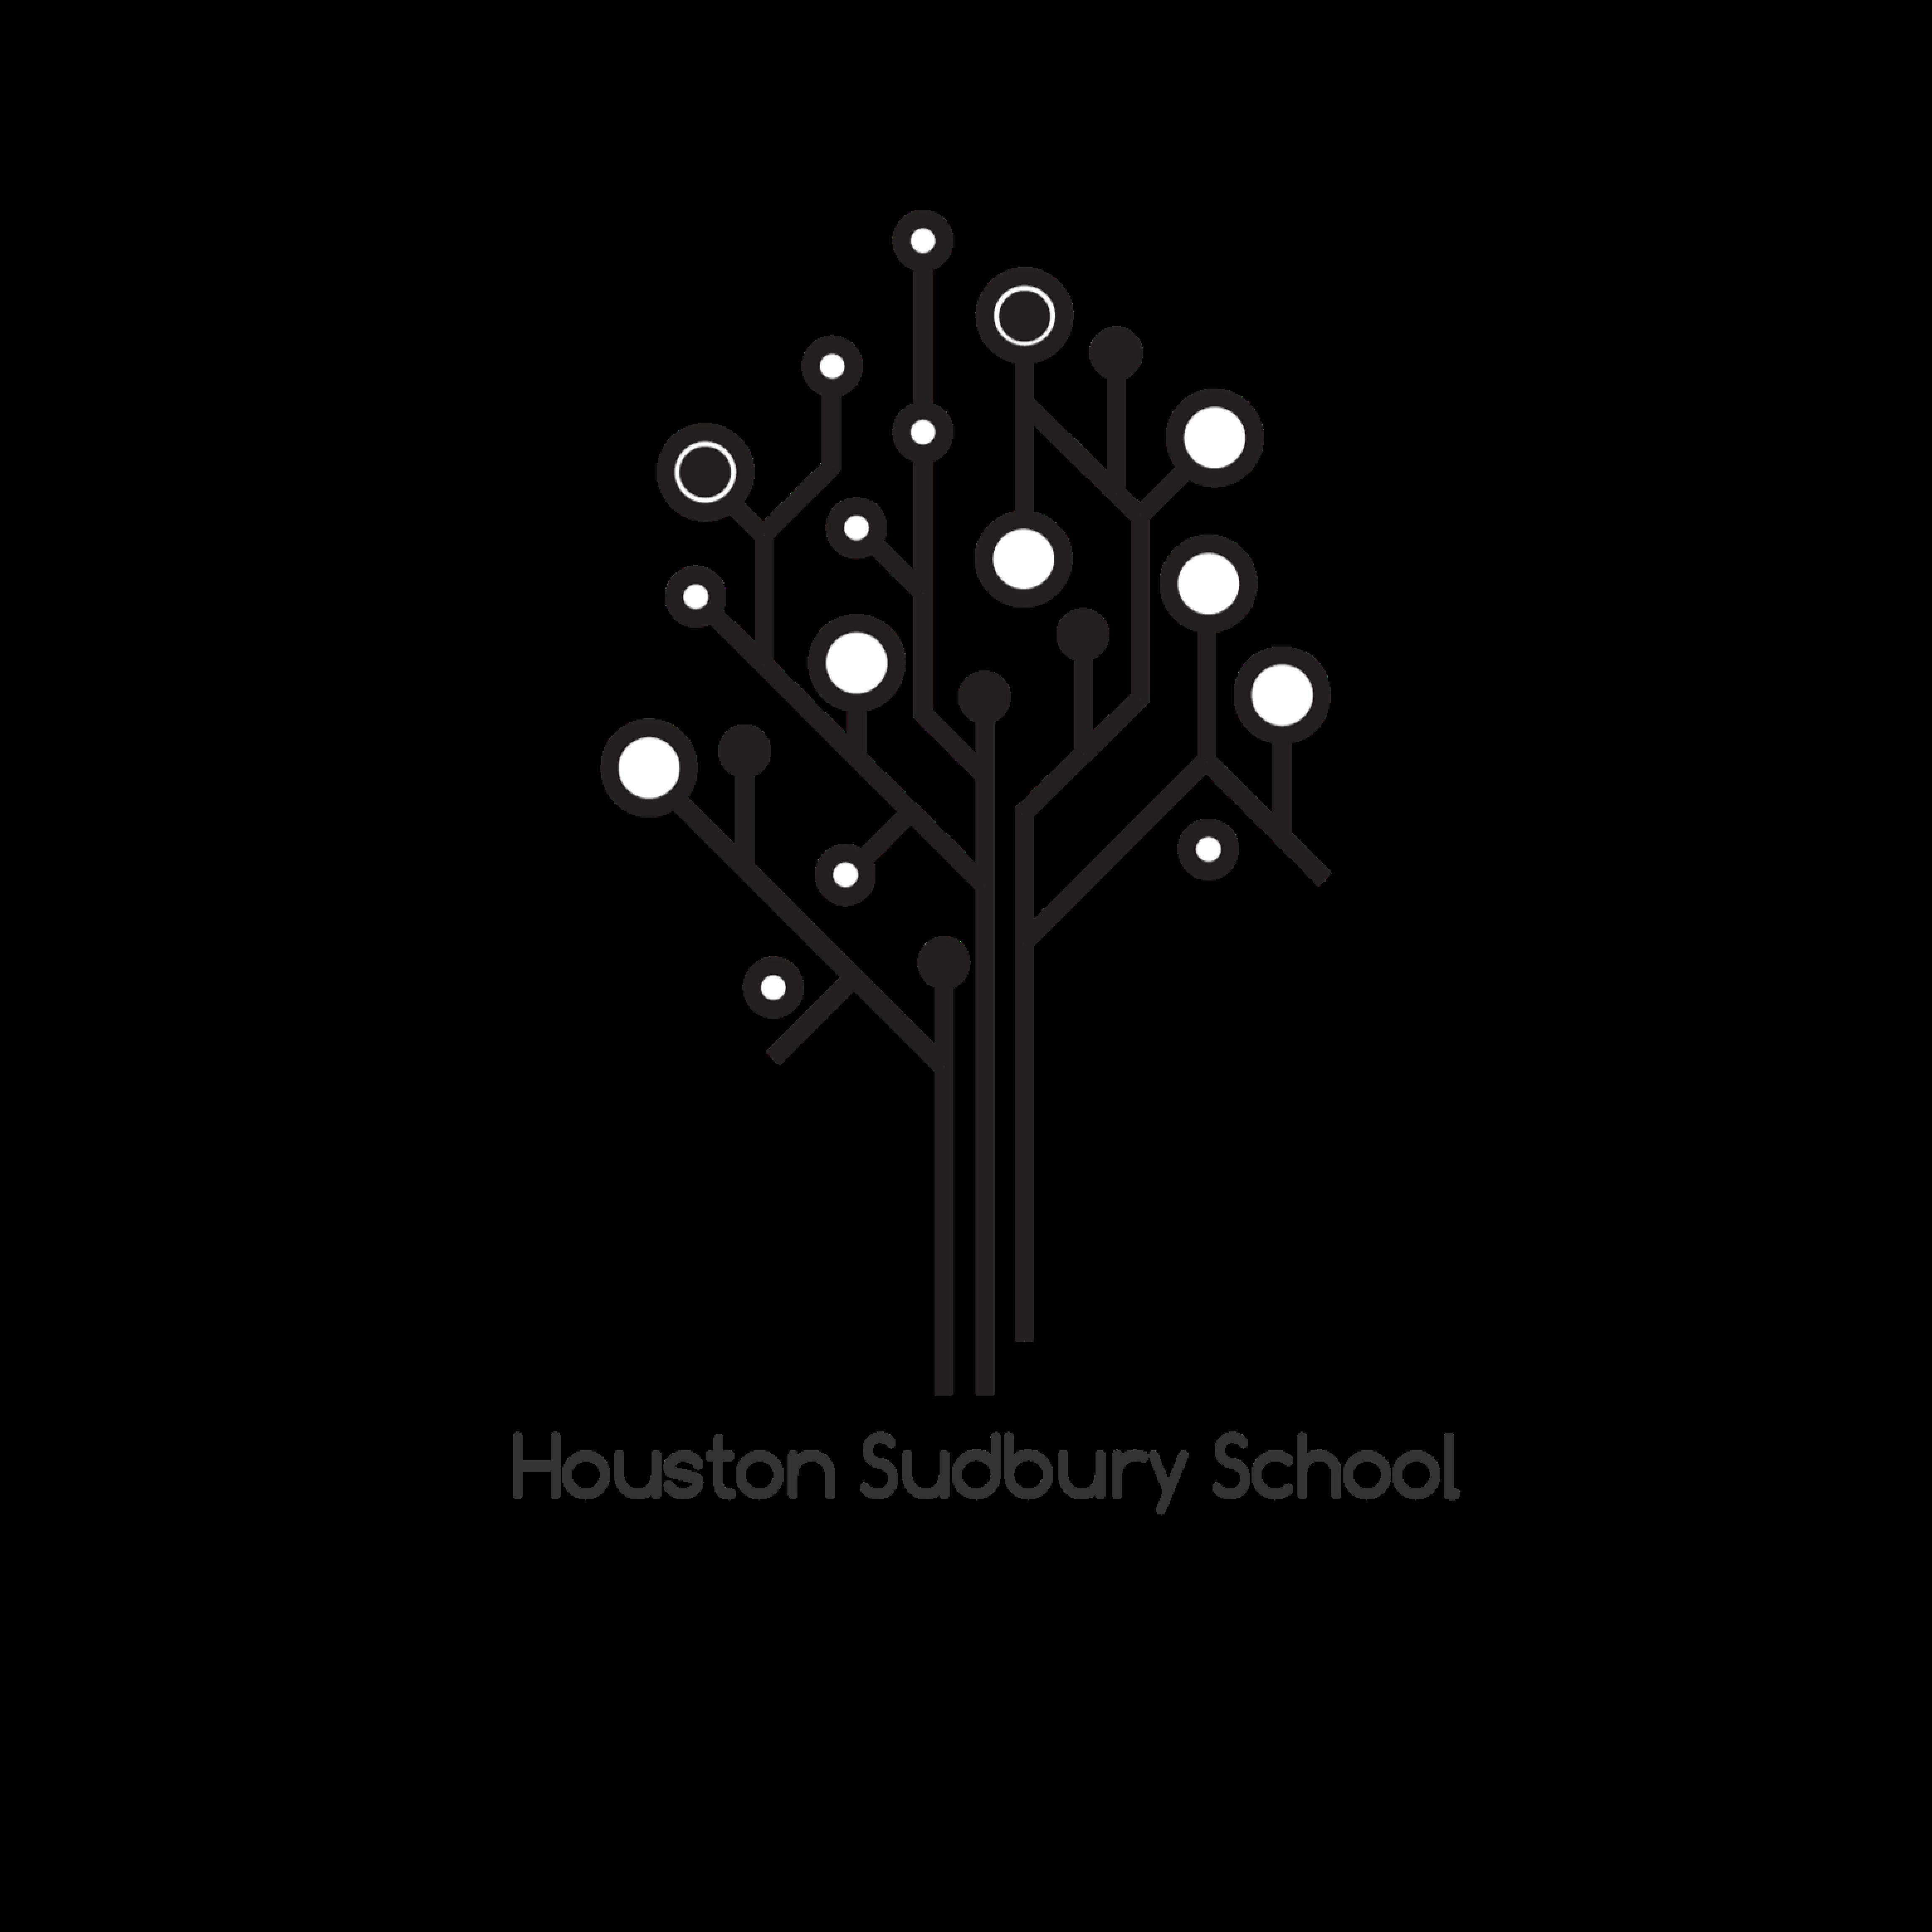 Houston Sudbury School